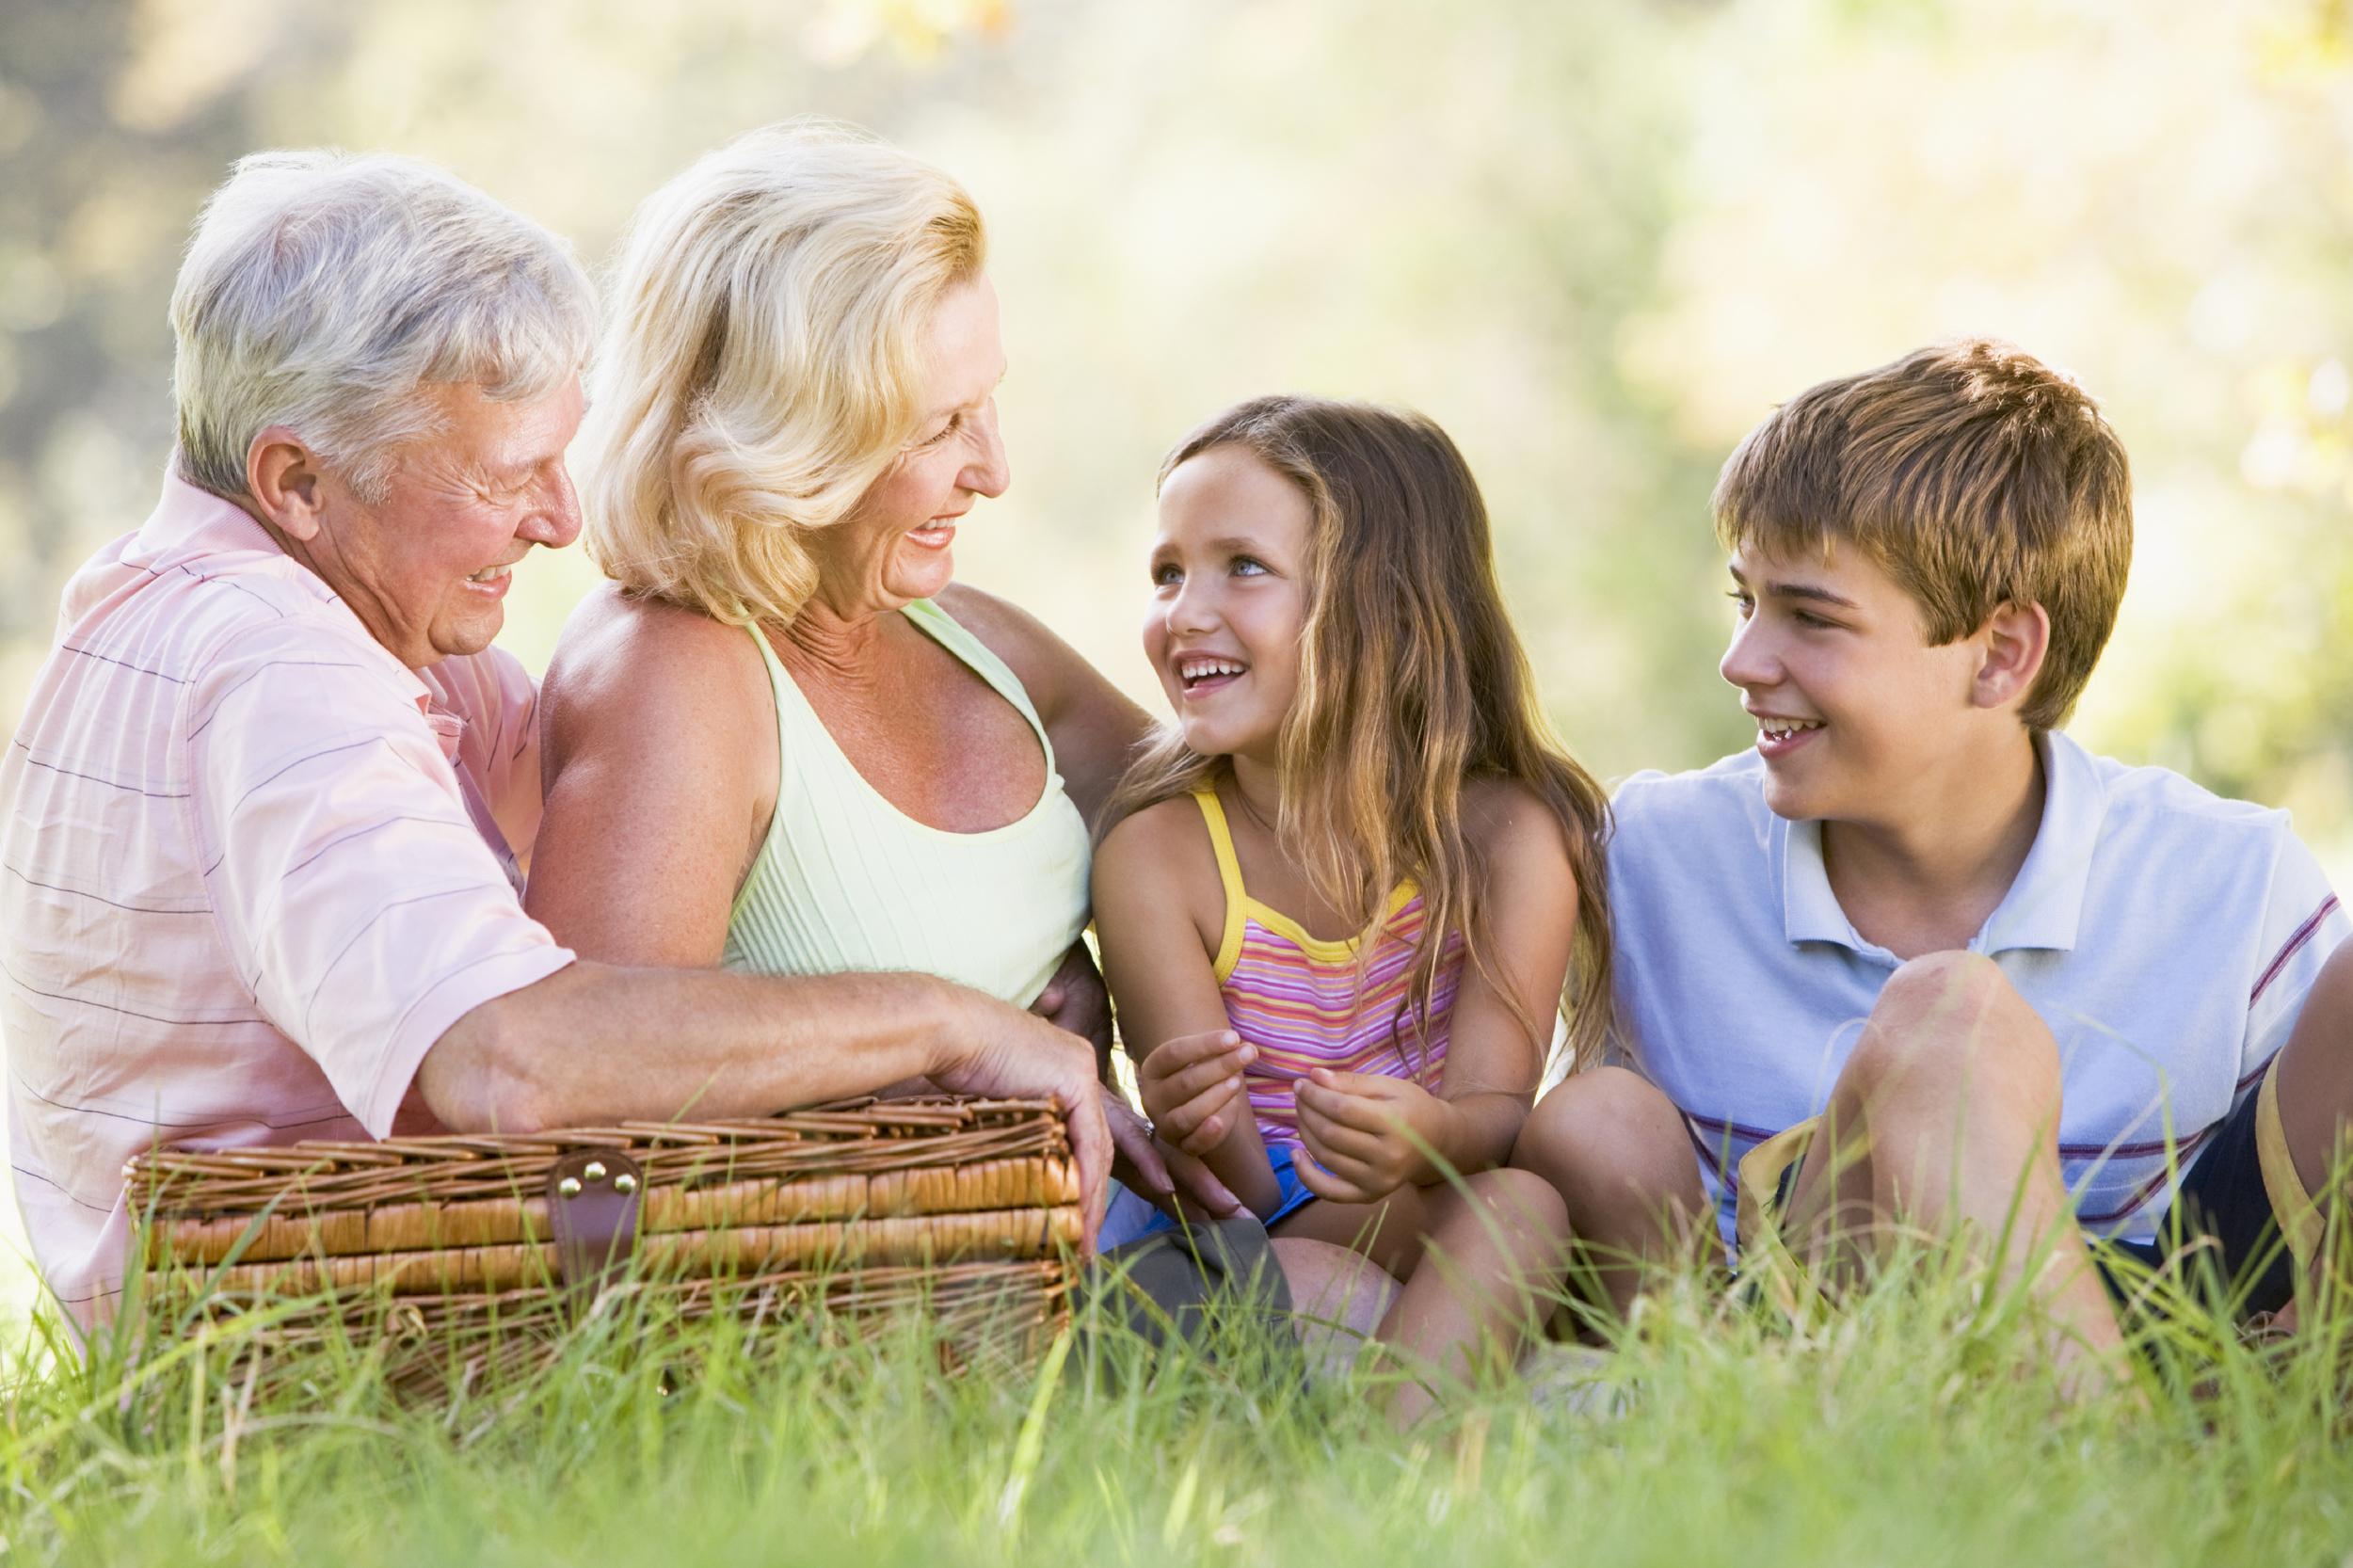 Callawassie Island Grandparents having a picnic with grandchildren